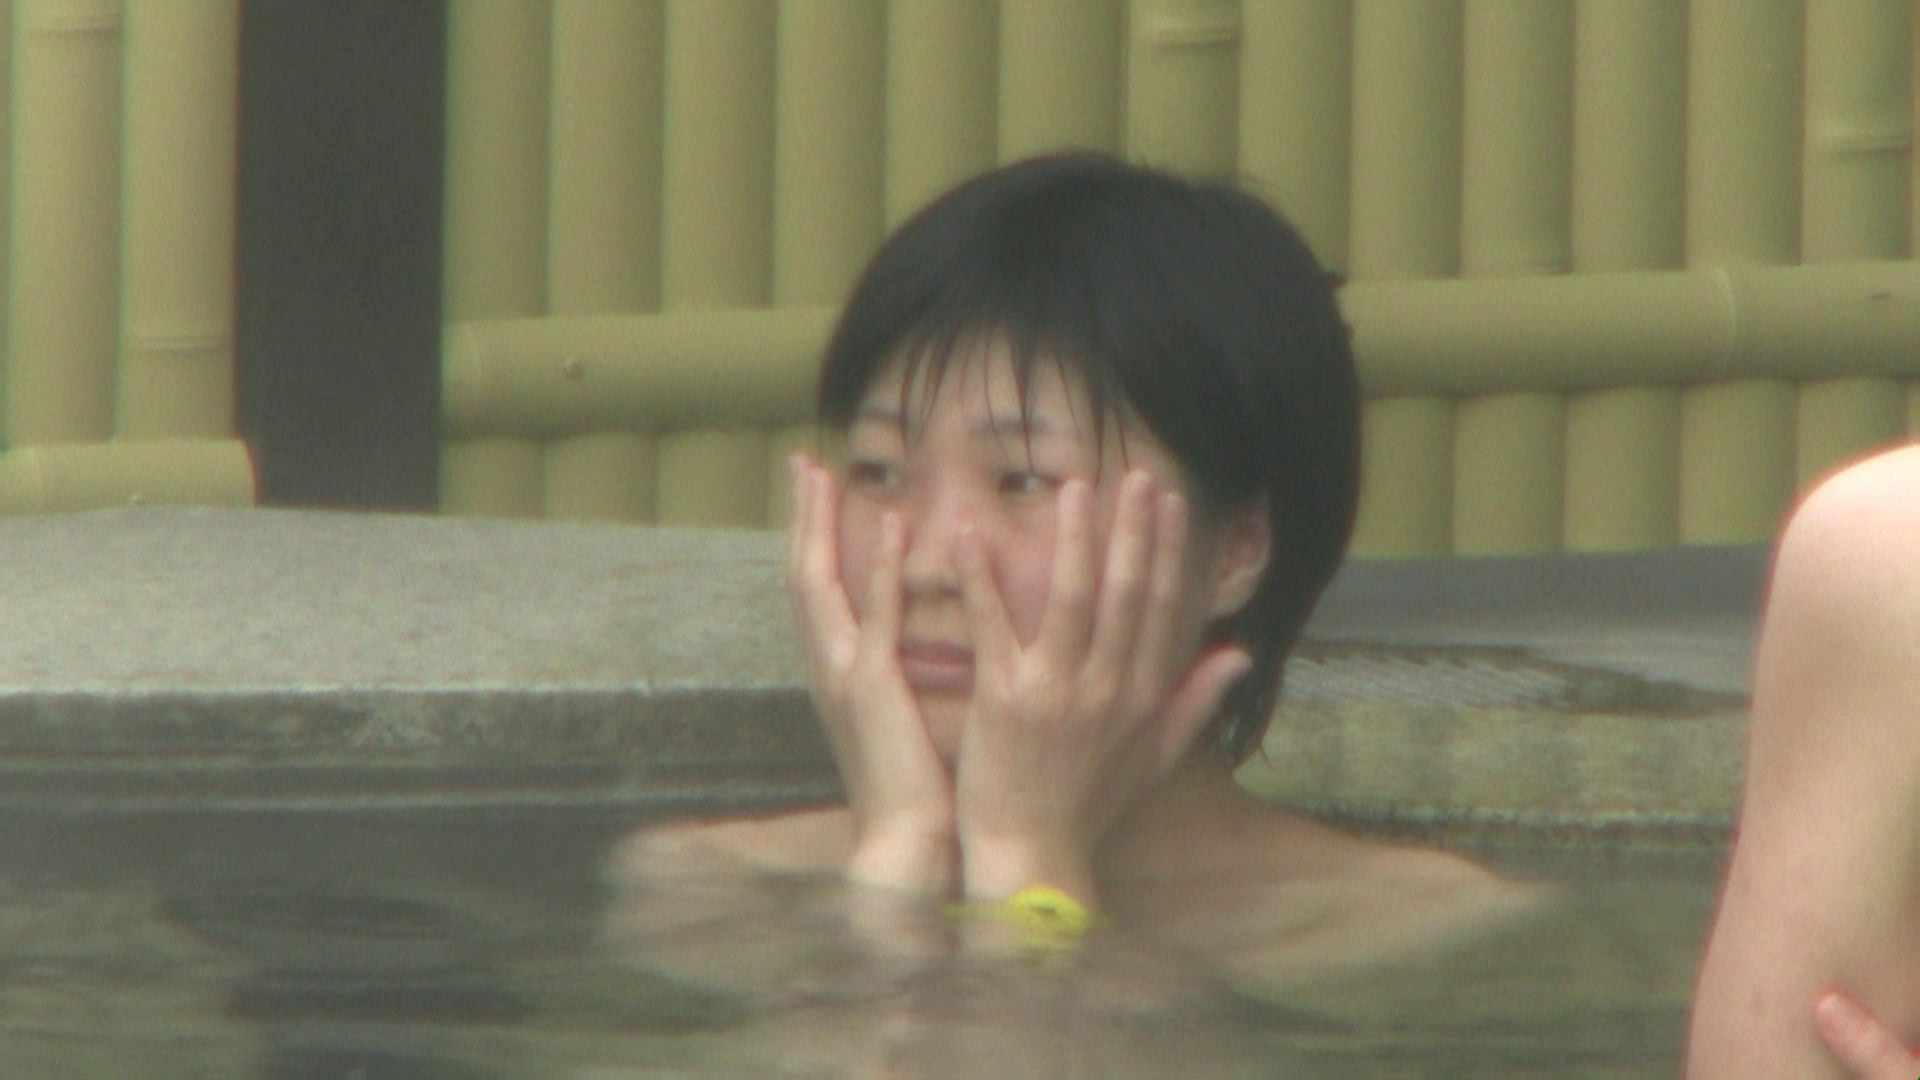 Aquaな露天風呂Vol.74【VIP限定】 露天風呂編  103PIX 80